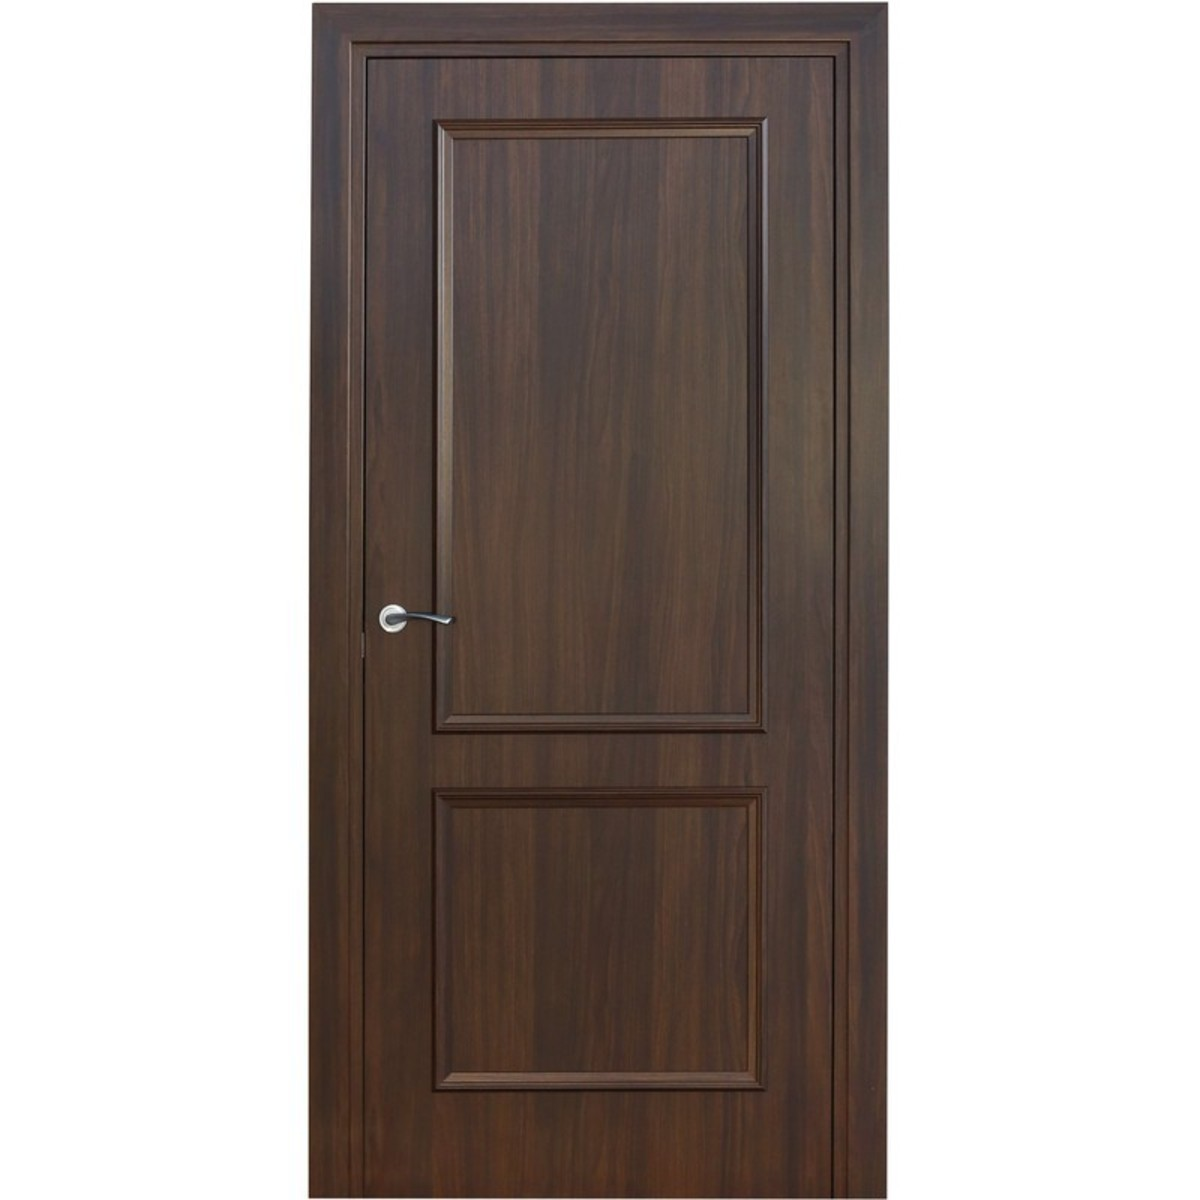 Дверь Межкомнатная Глухая Altro 70x200 Ламинация Цвет Орех Марроне